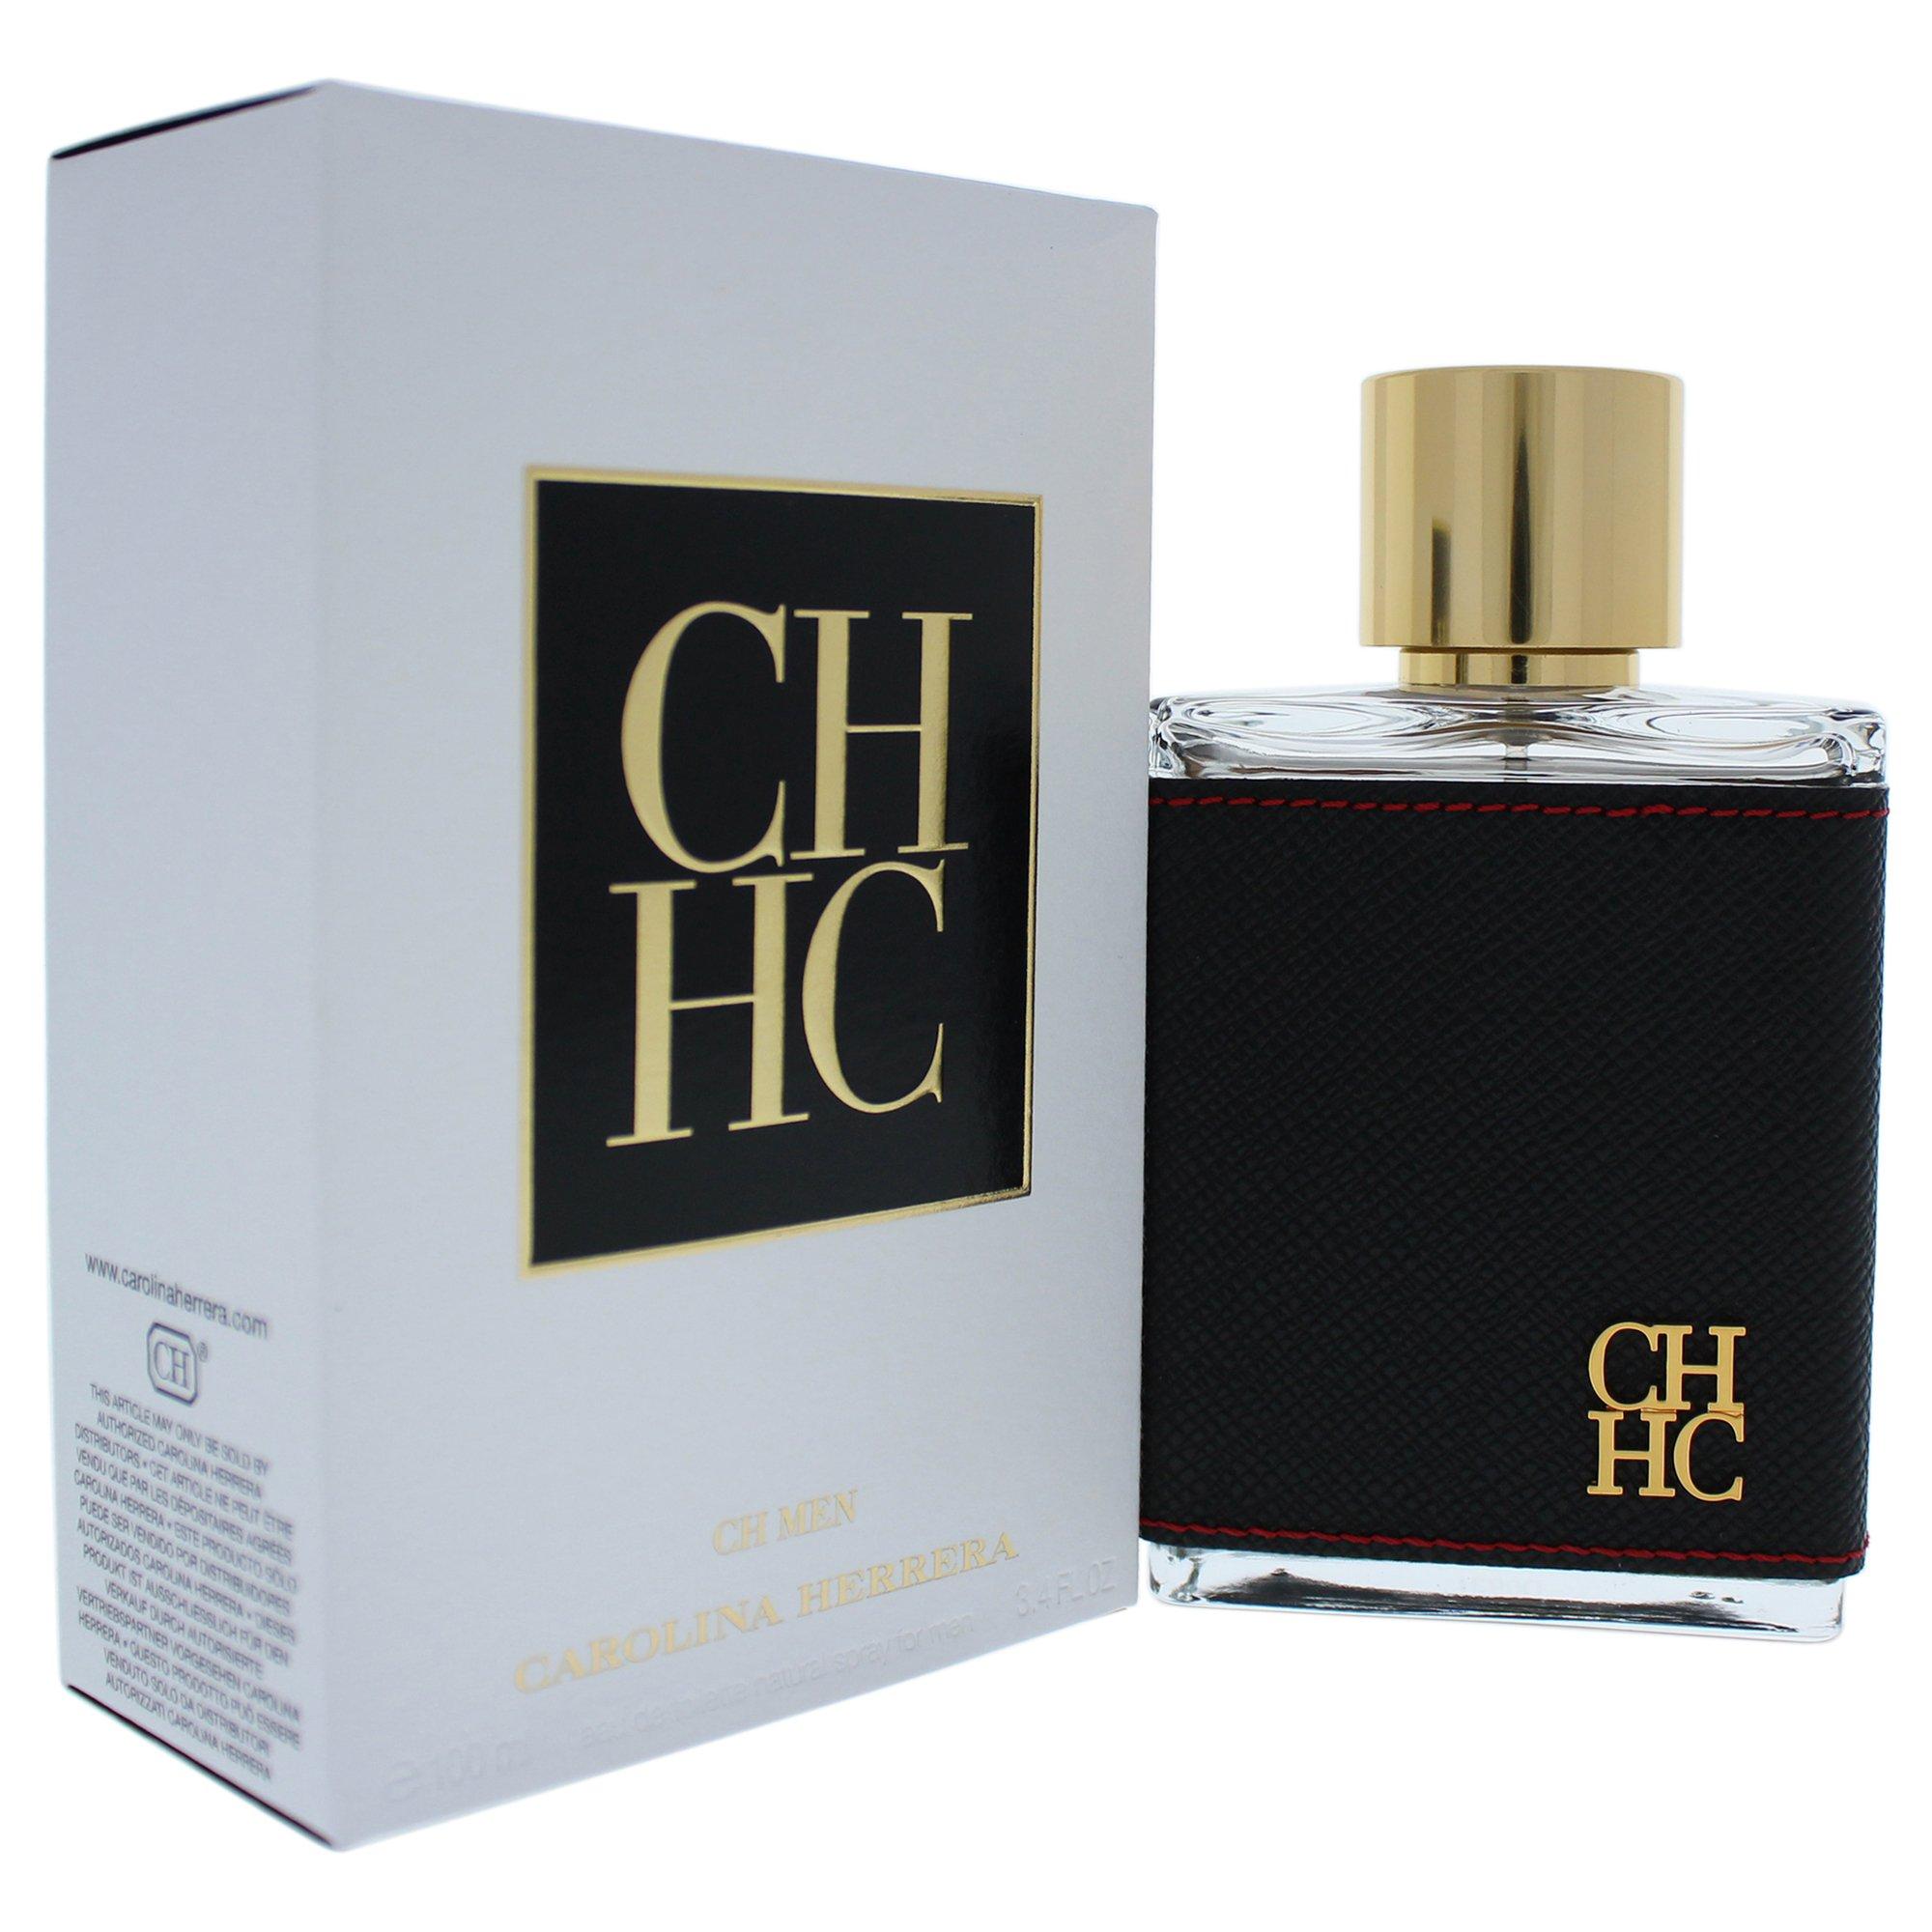 9a4dfee38a Amazon.com  CH by Carolina Herrera for Men - 3.4 oz EDT Spray  CAROLINA  HERRERA  Beauty